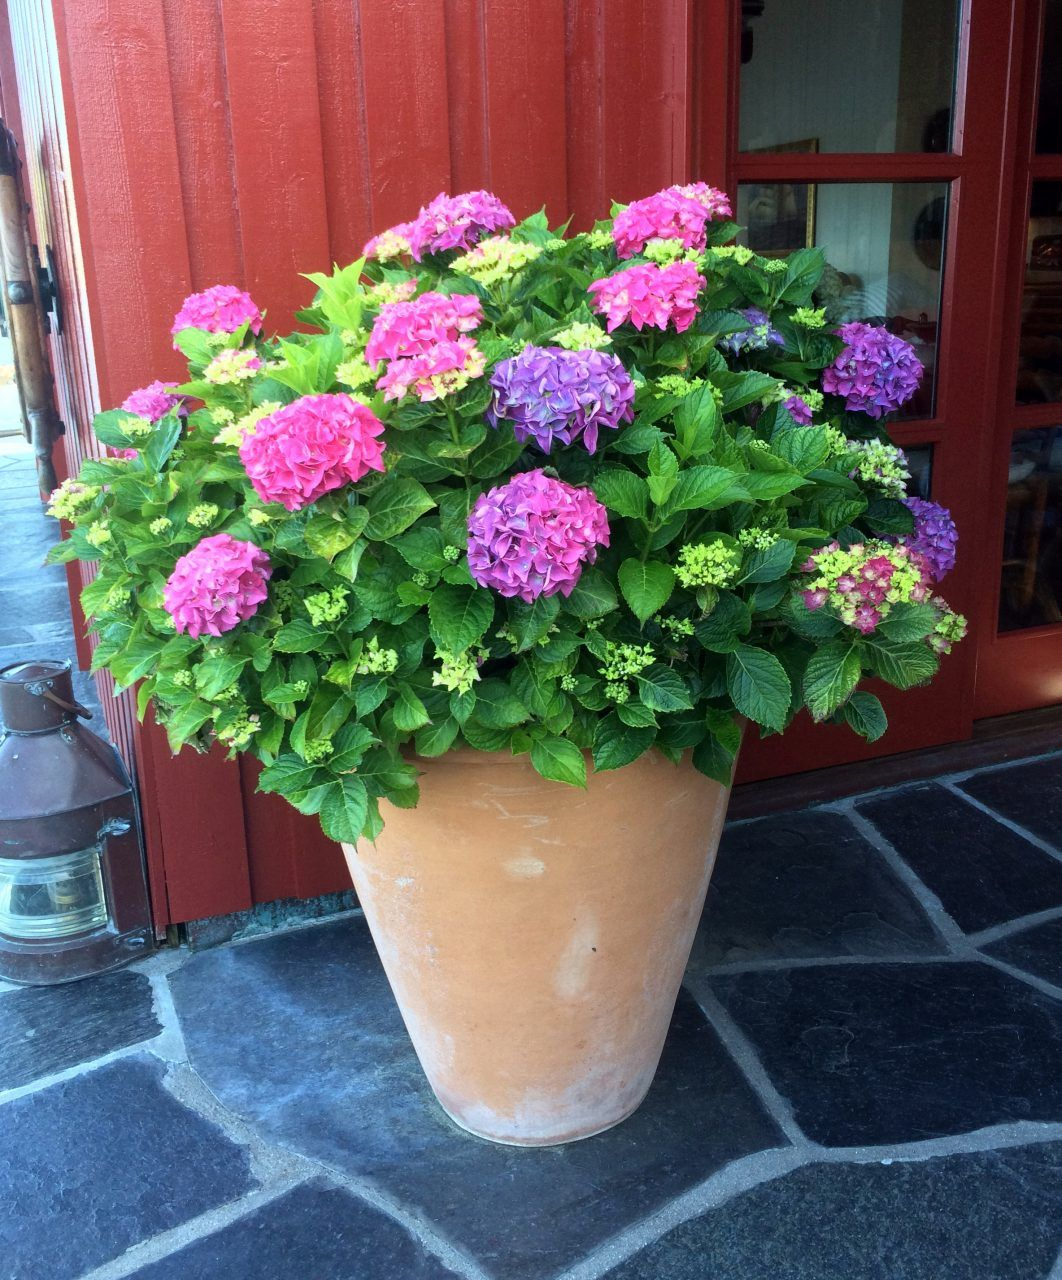 A Plante I Krukker Med Billeder Plante Krukker Blomster